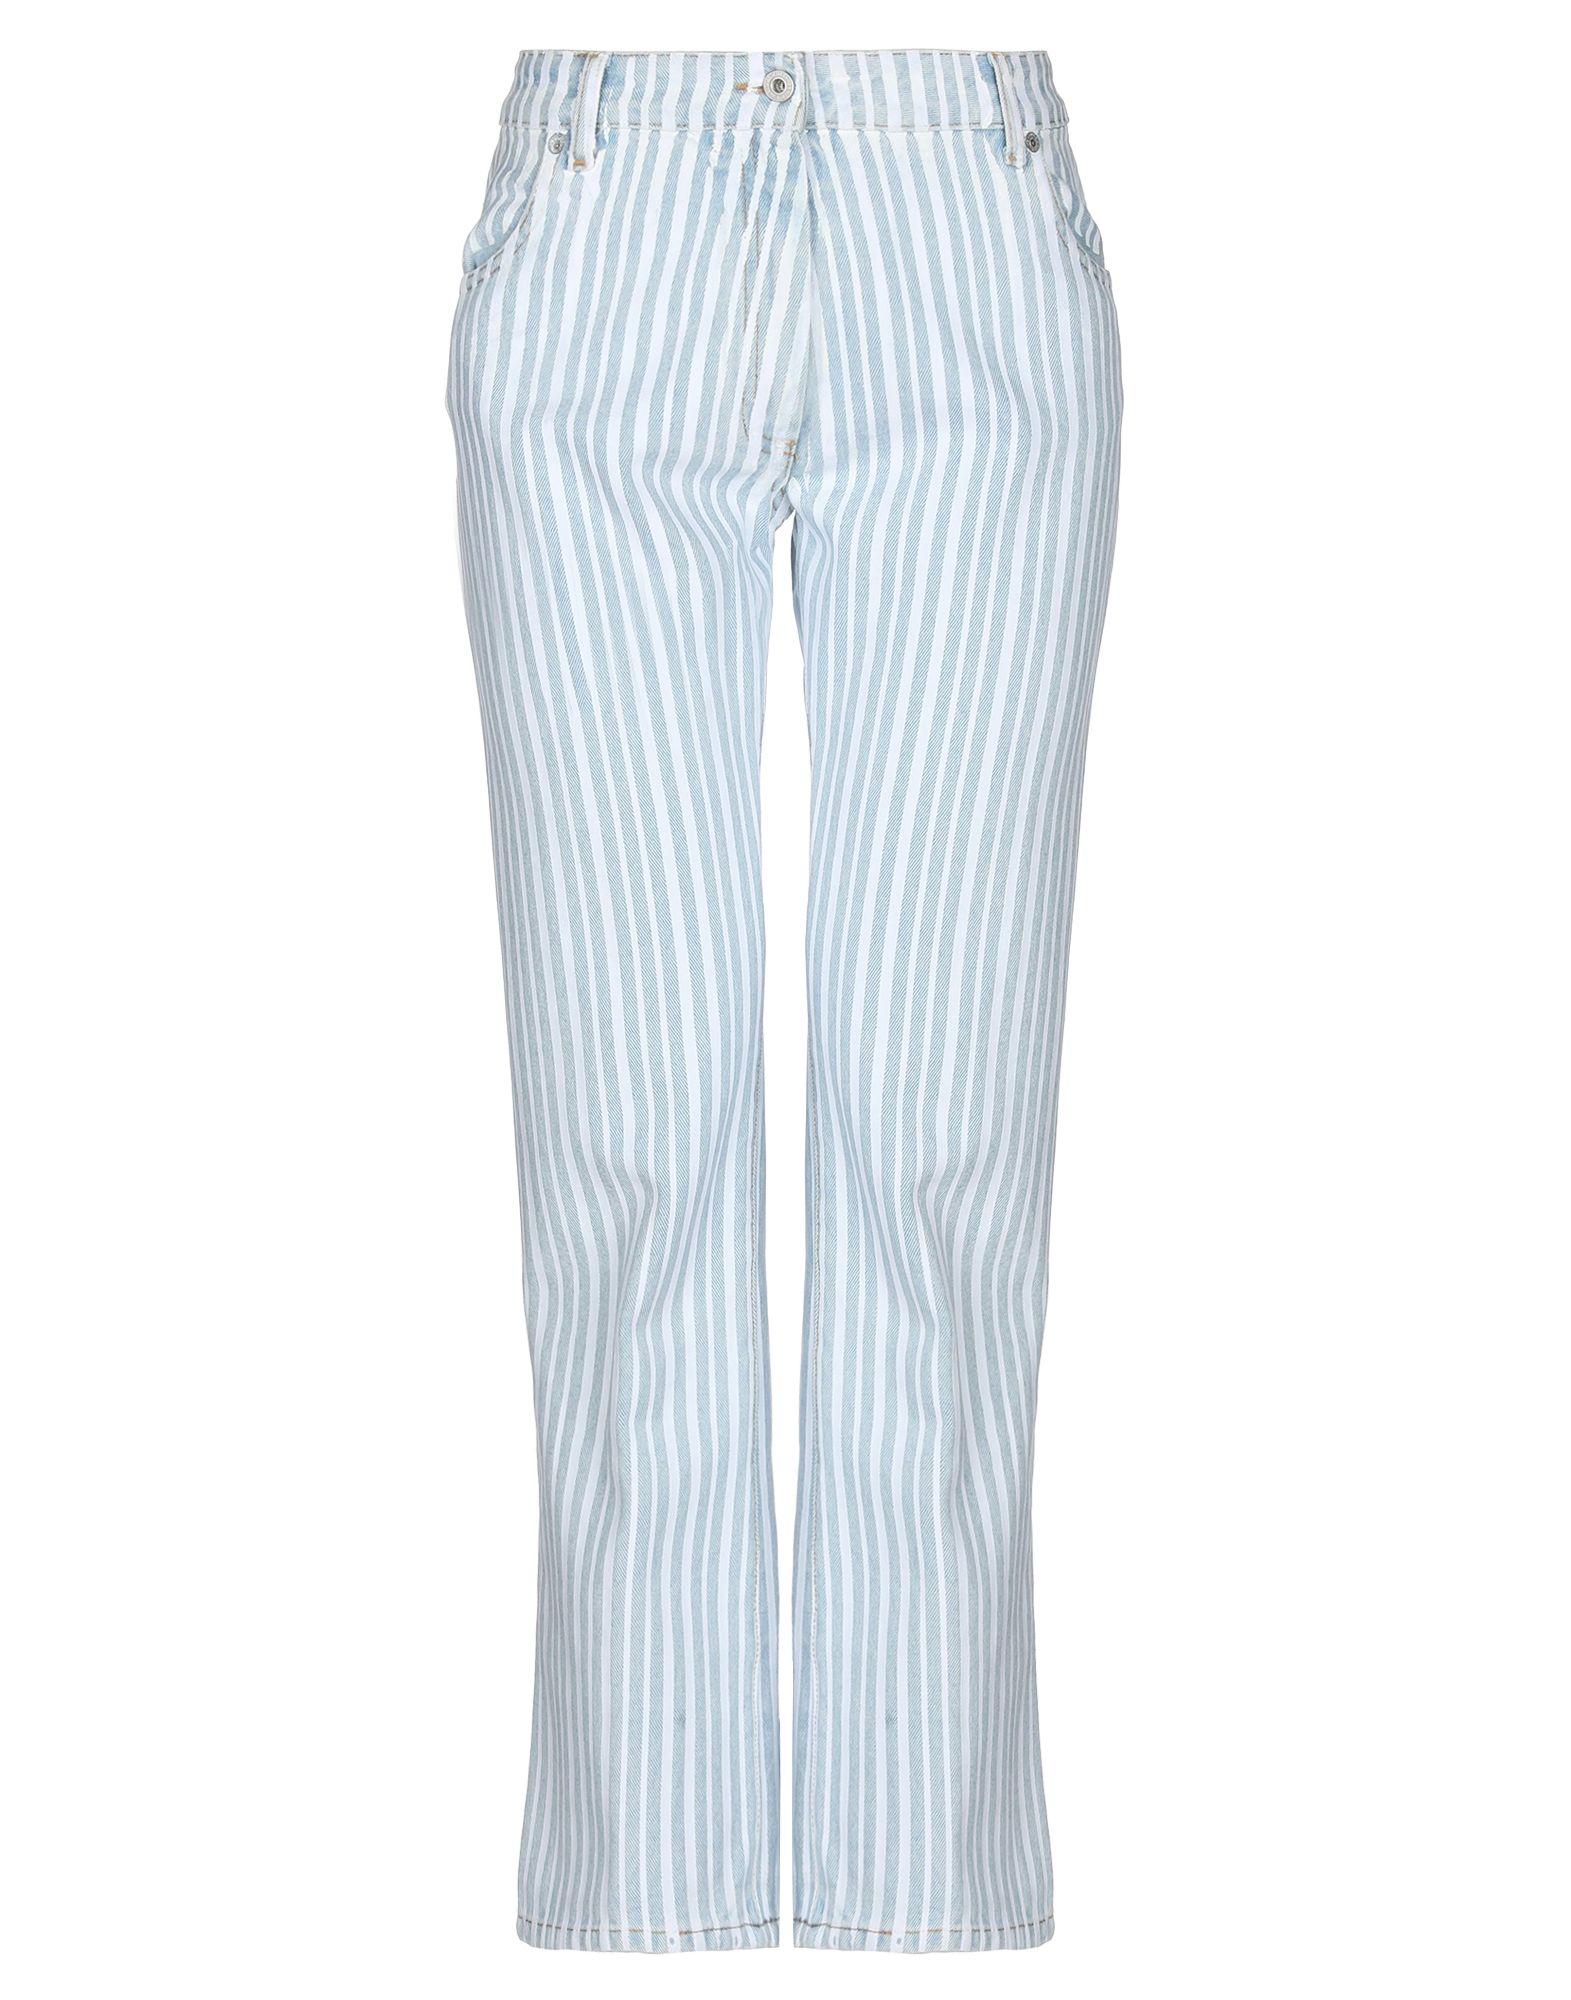 OFF-WHITE™ Denim pants - Item 42772846